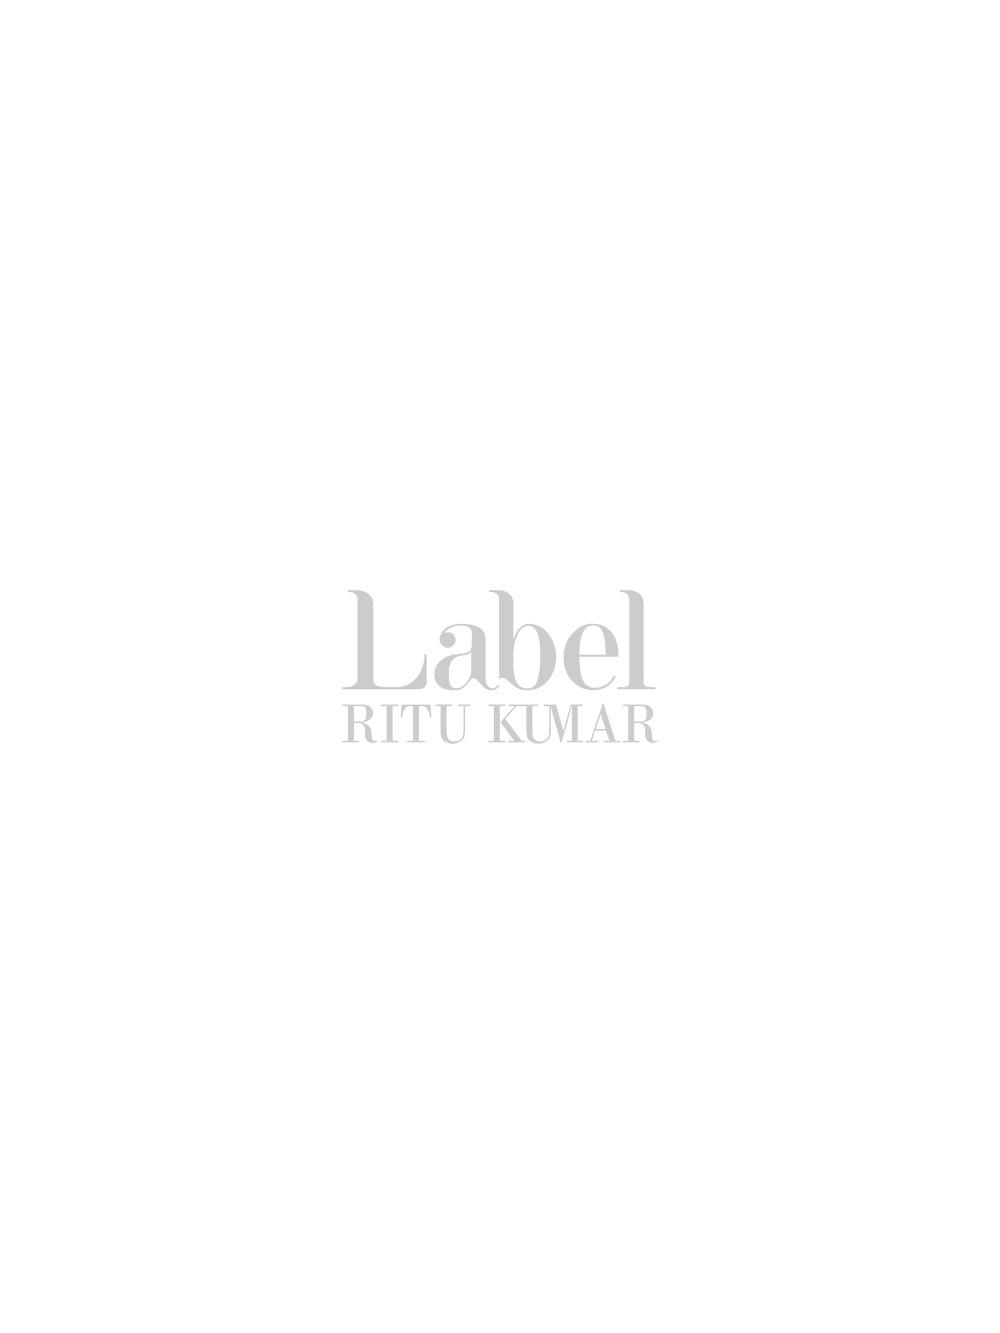 Label Ritu Kumar | Shirt Dress, Floral Print Shirt Dress, Long